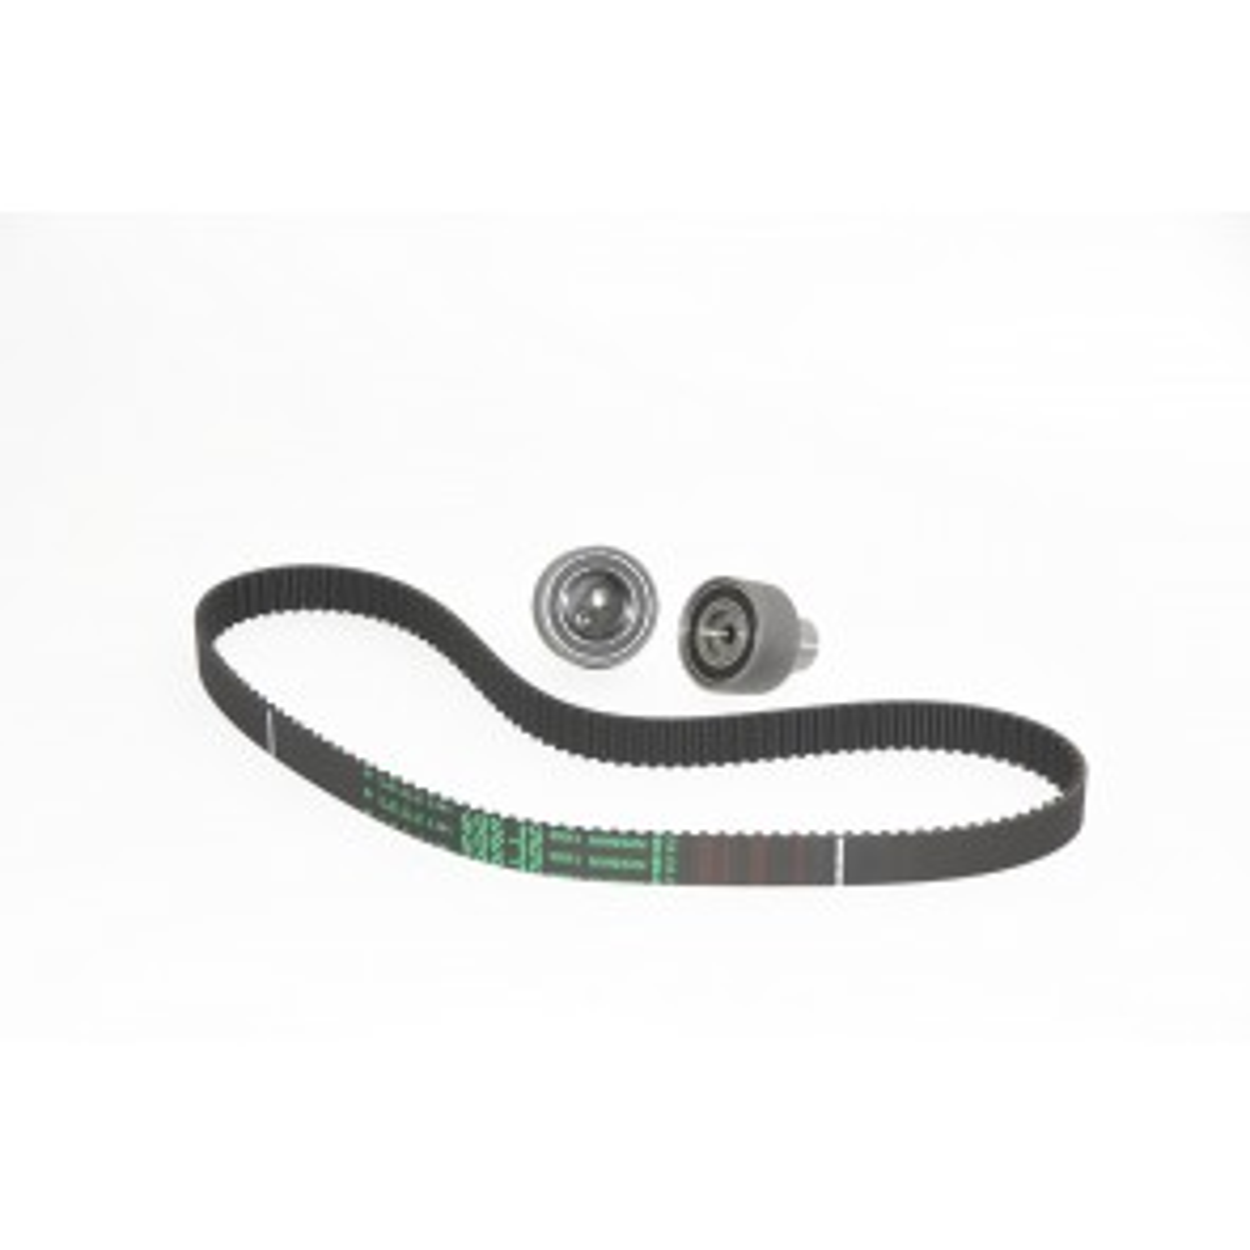 Genuine Nissan Replacement Cambelt Kit With Tensioner & Idler For Nissan Skyline R32 R33 R34 GTR RB26DETT